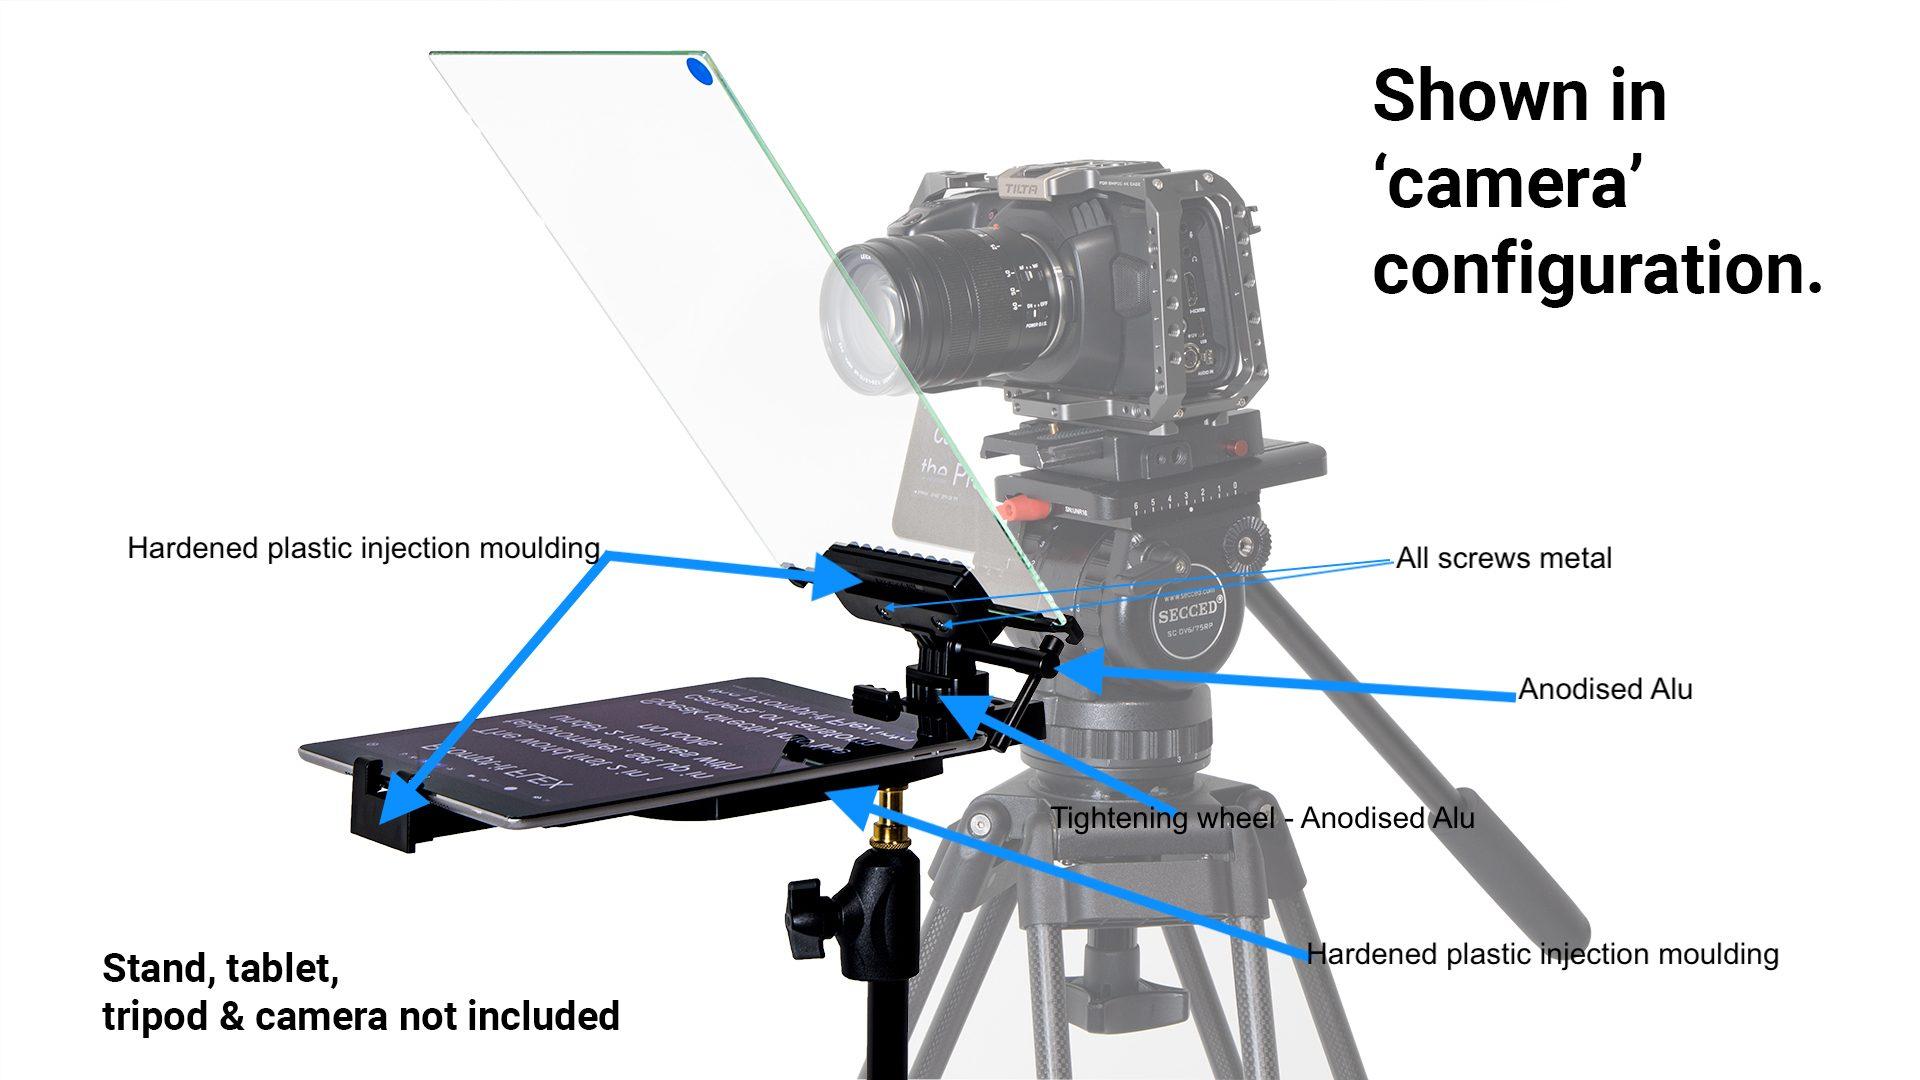 Flex teleprompter in camera configuration